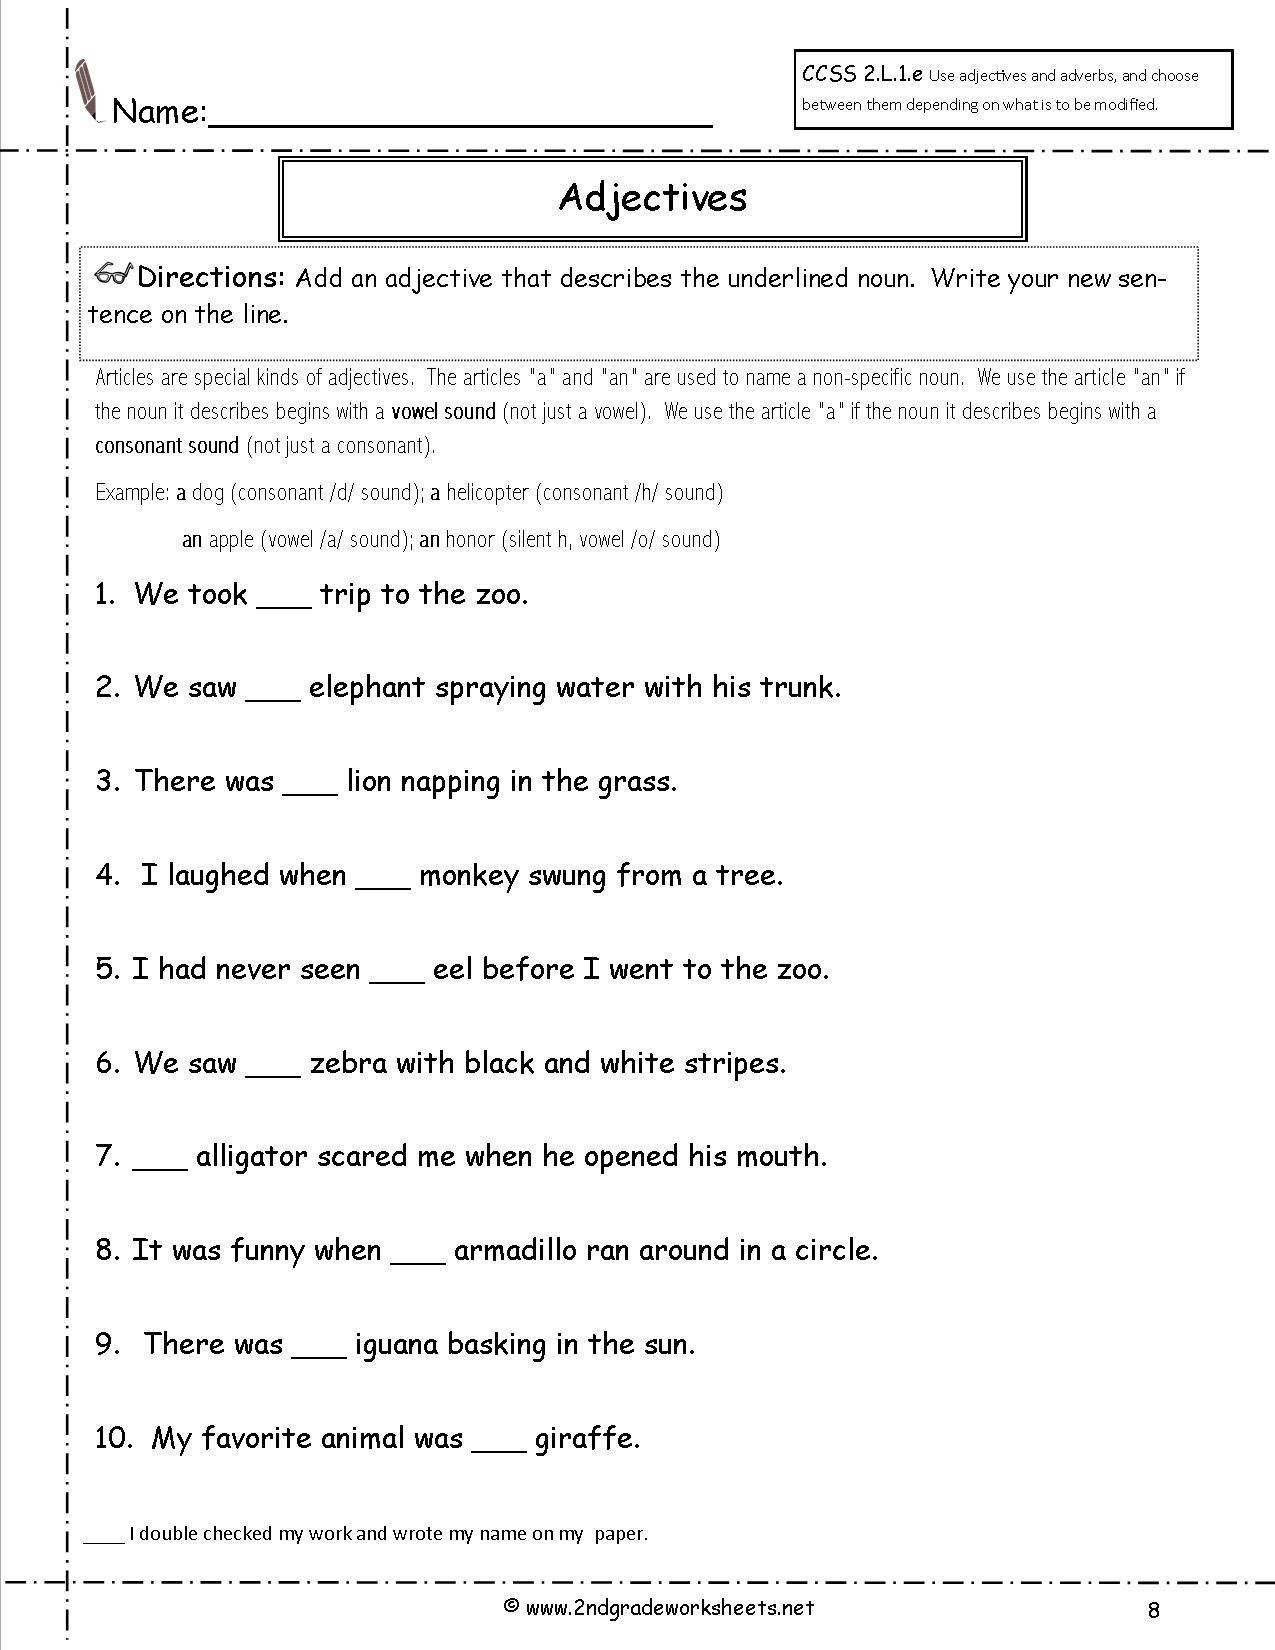 42 Printable Worksheets English Grammar In 2020 2nd Grade Worksheets Third Grade Grammar Worksheets Grammar Worksheets